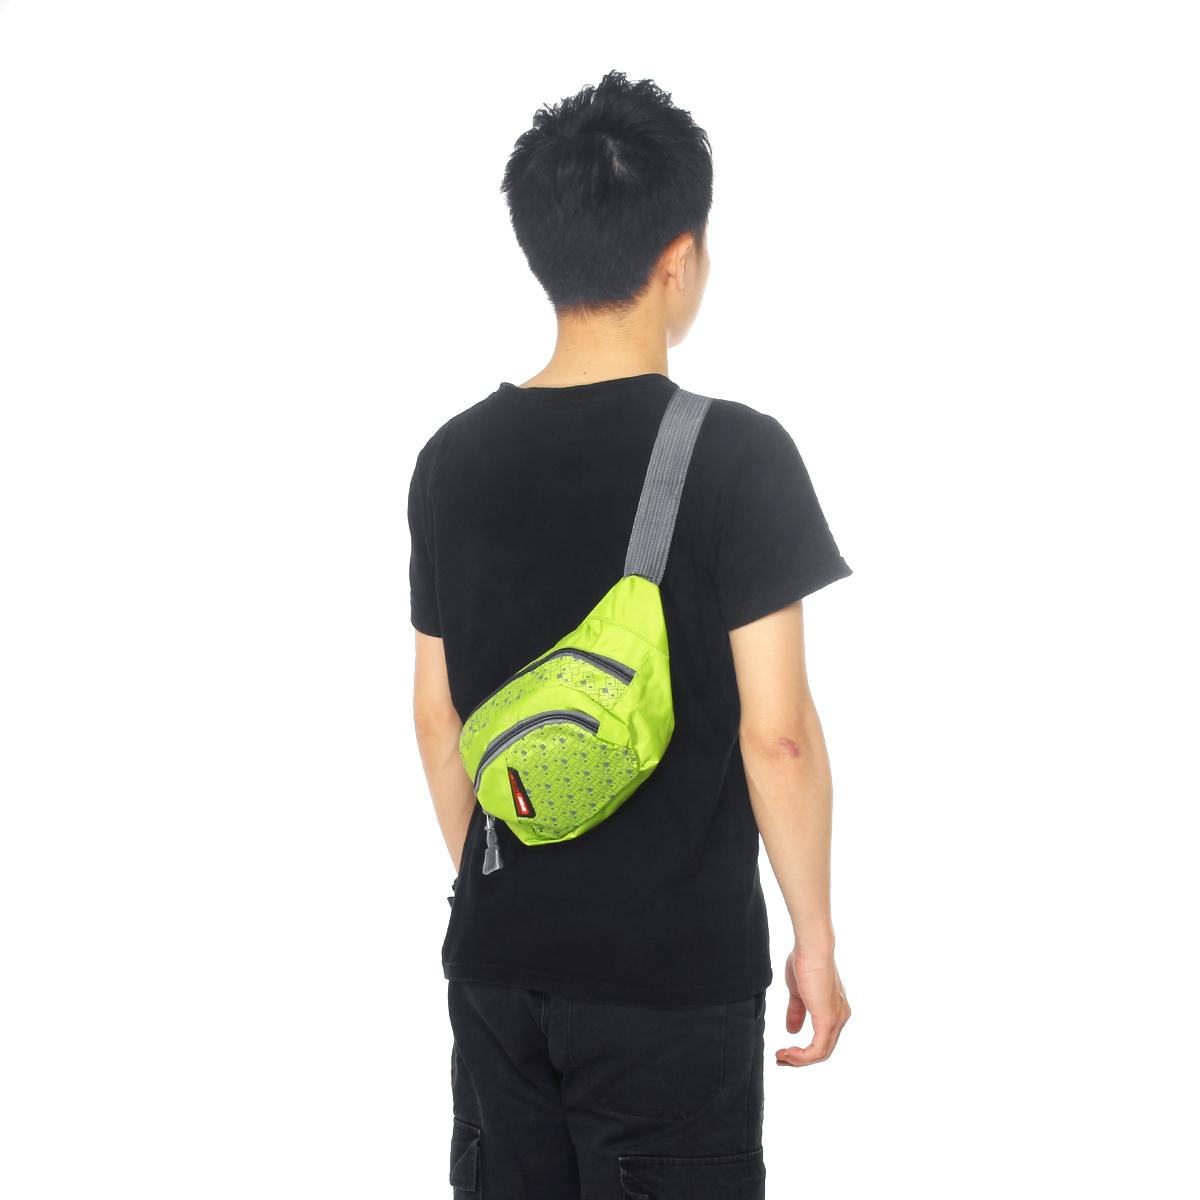 Outdoor Sport Bag Waist Bag Phone Bag Crossbody Bag For Travel Sports Running Jogging Hiking Cycling